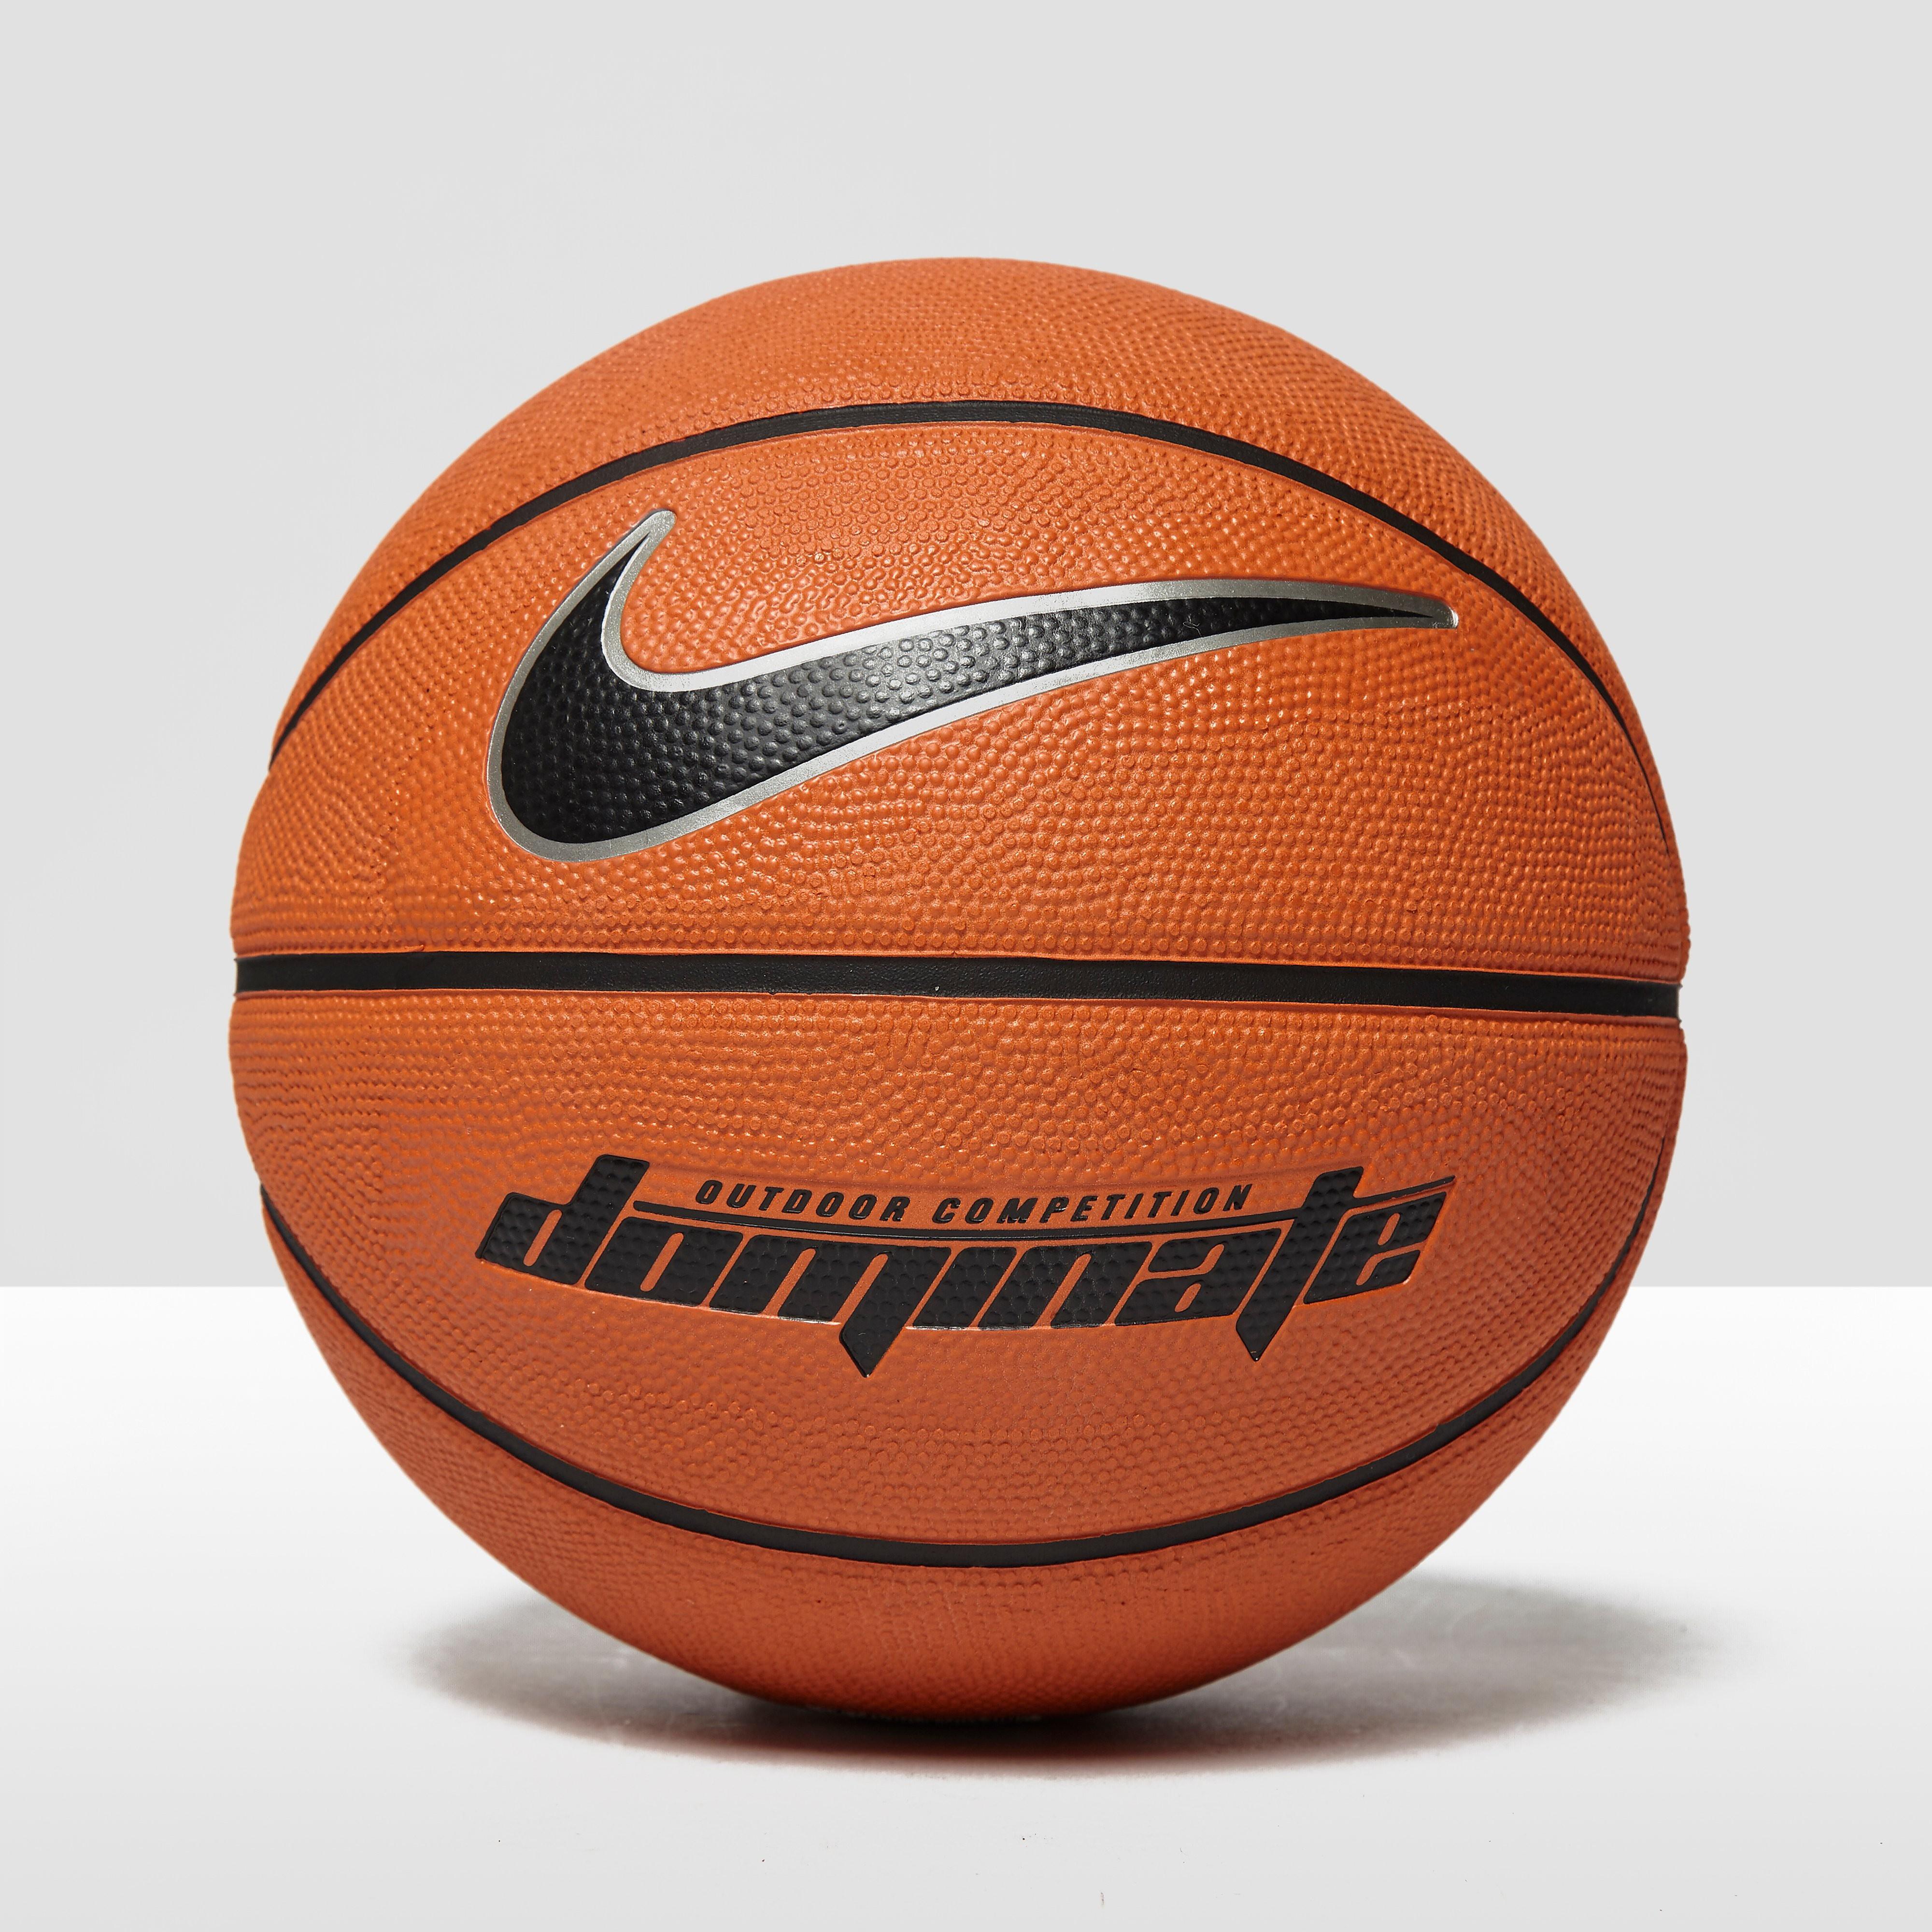 Nike Dominate (Size 7) Basketball